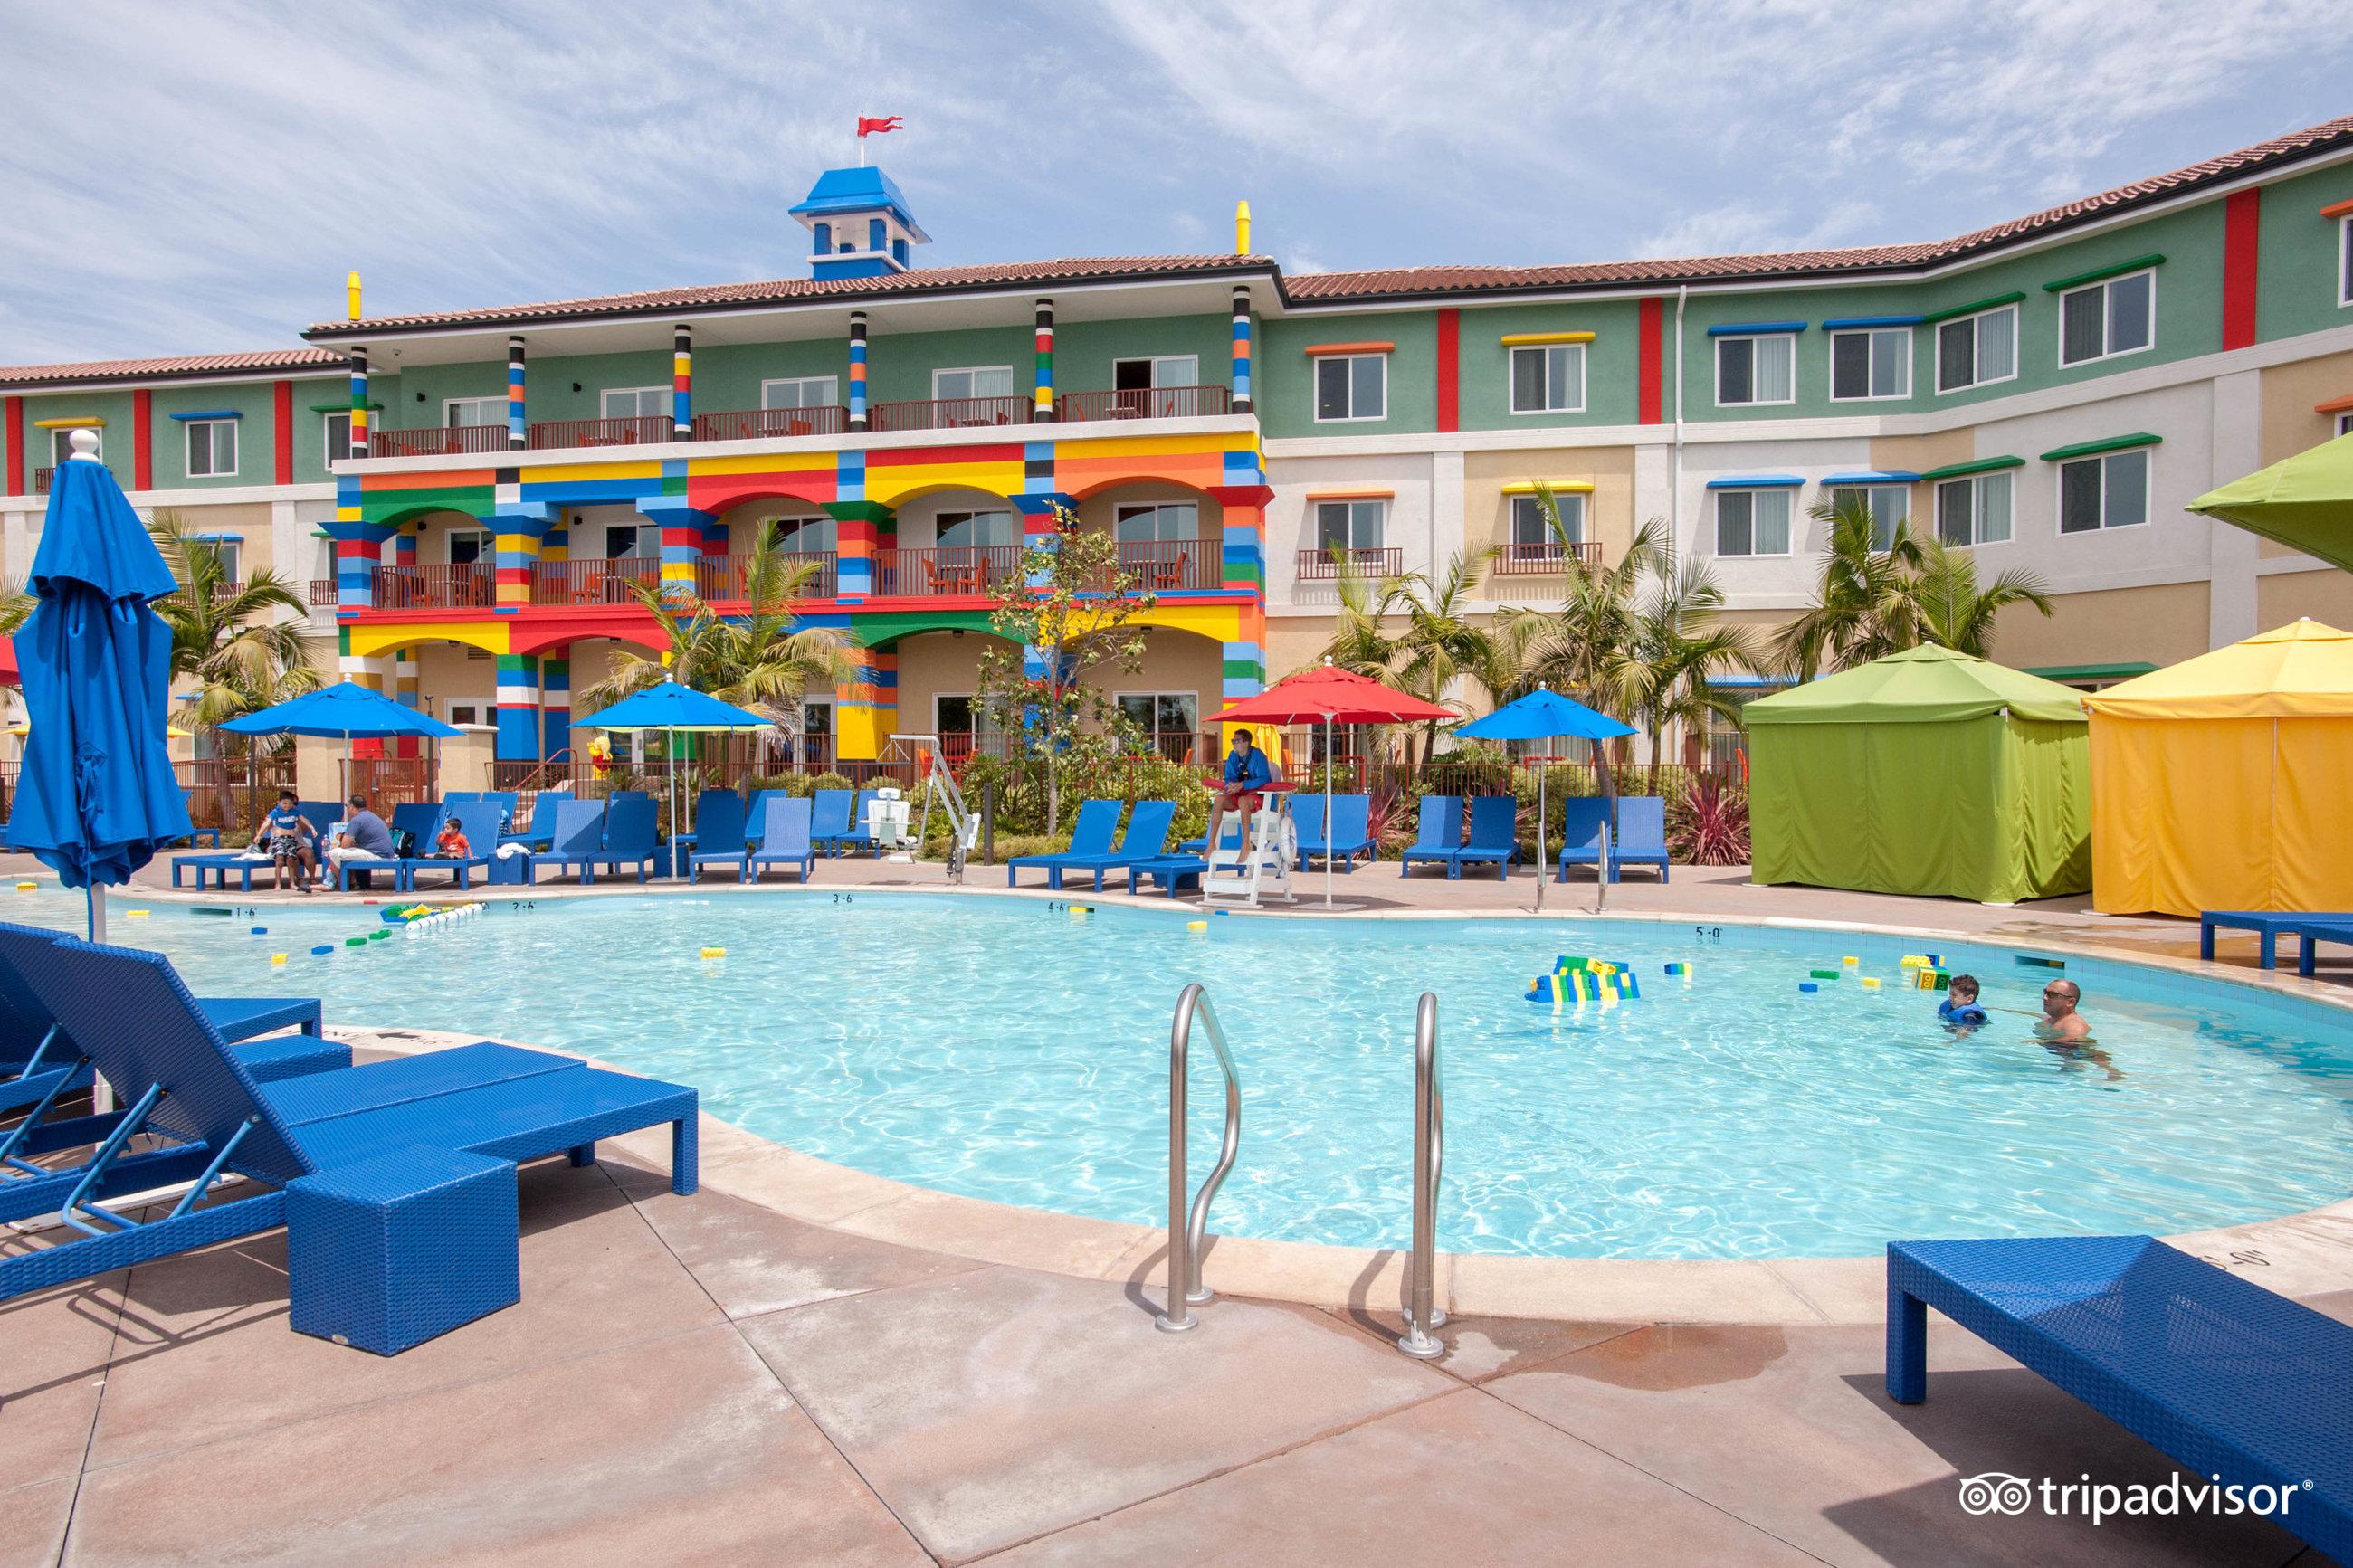 legoland california hotel (carlsbad, ca) 2017 review - family